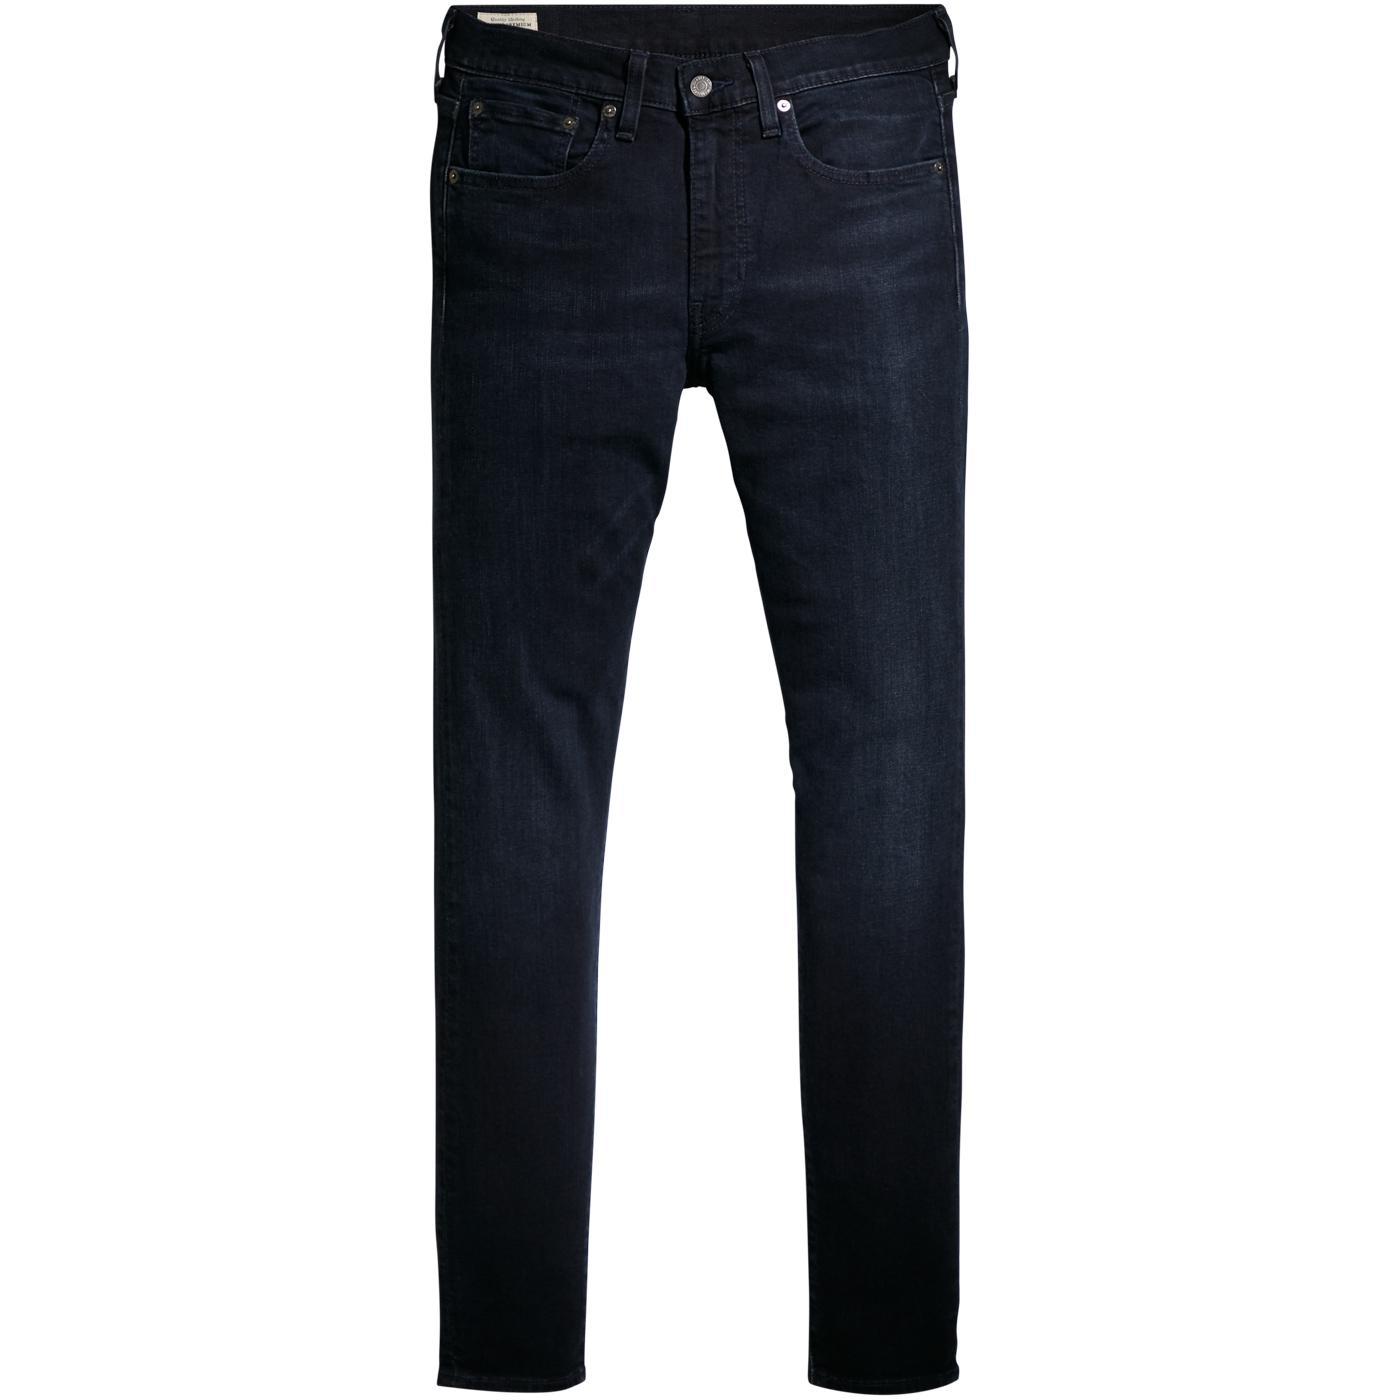 LEVI'S Skinny Taper Mod Jeans (Blue Ridge Adv.)